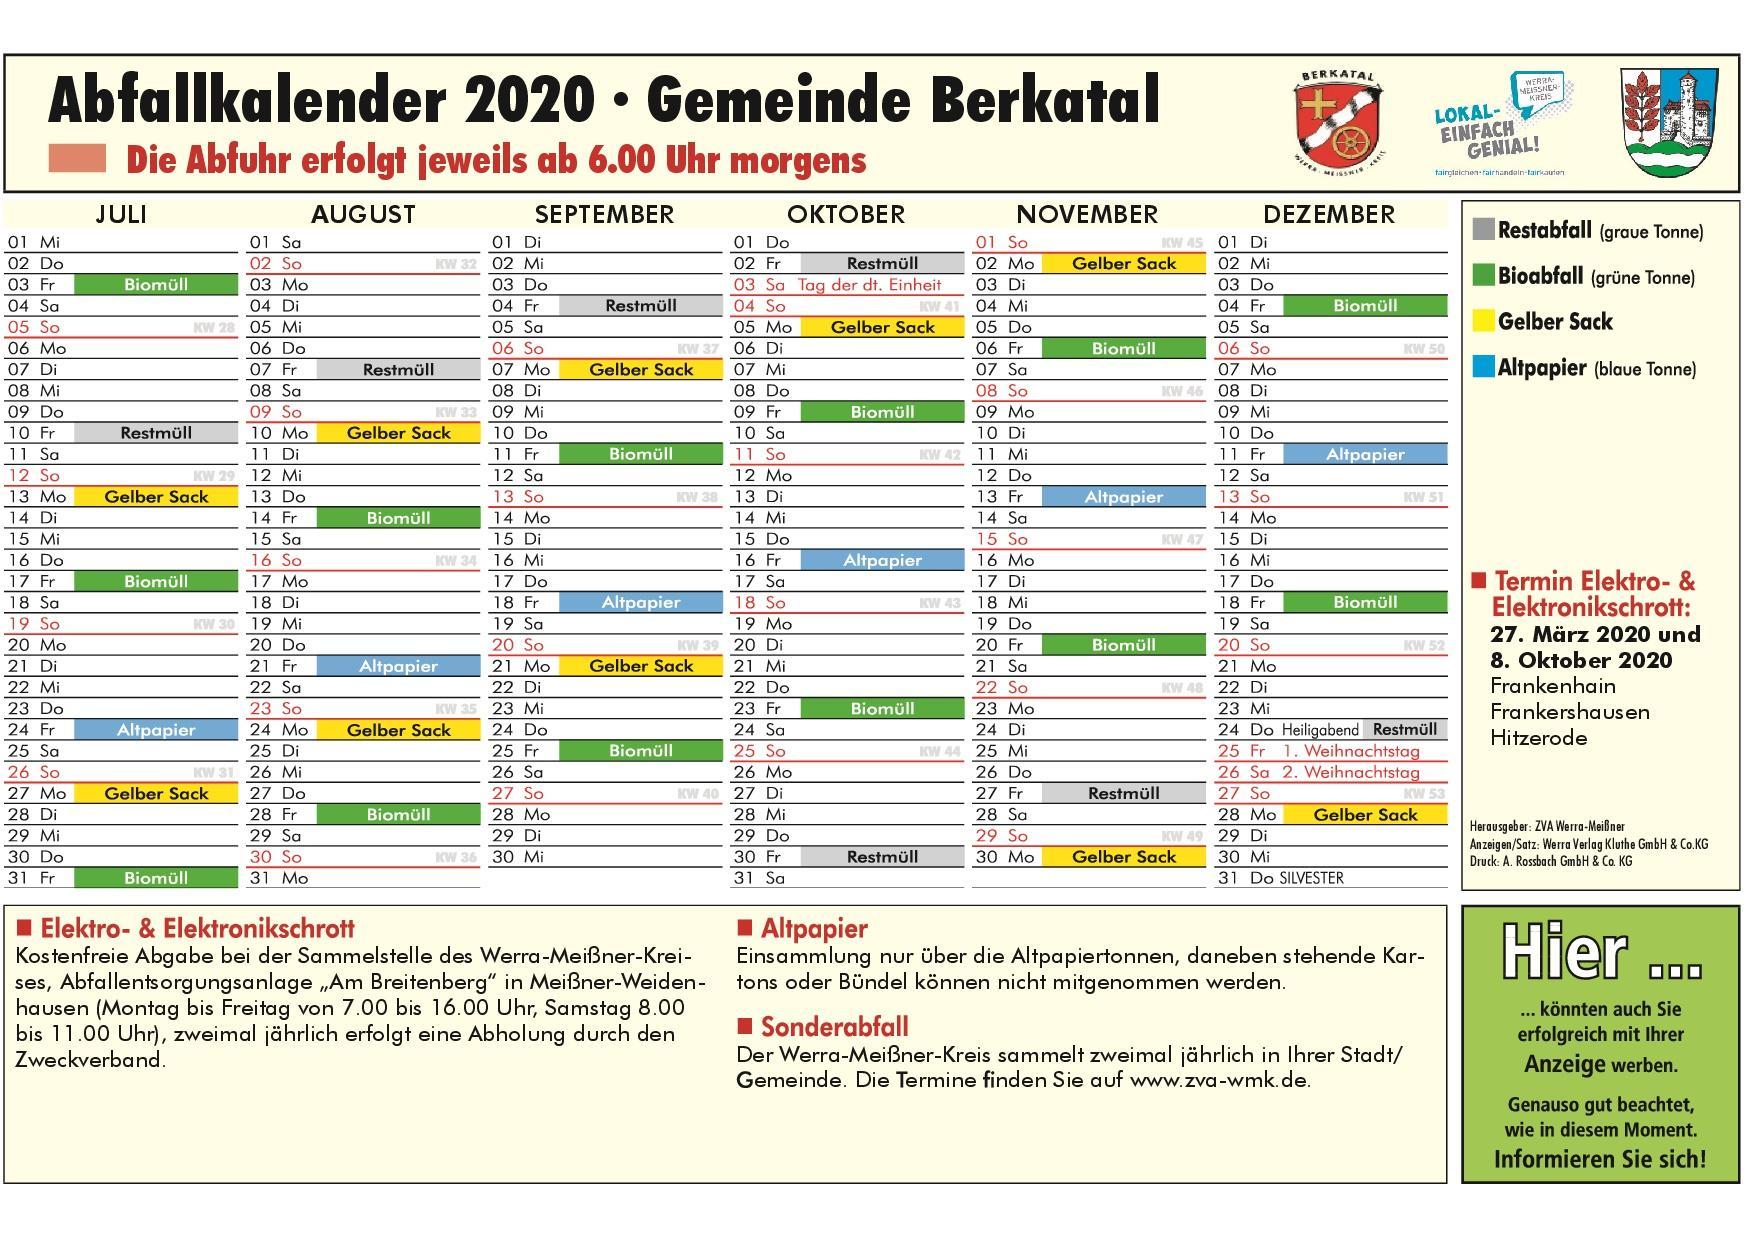 Abfallkalender 2. HJ